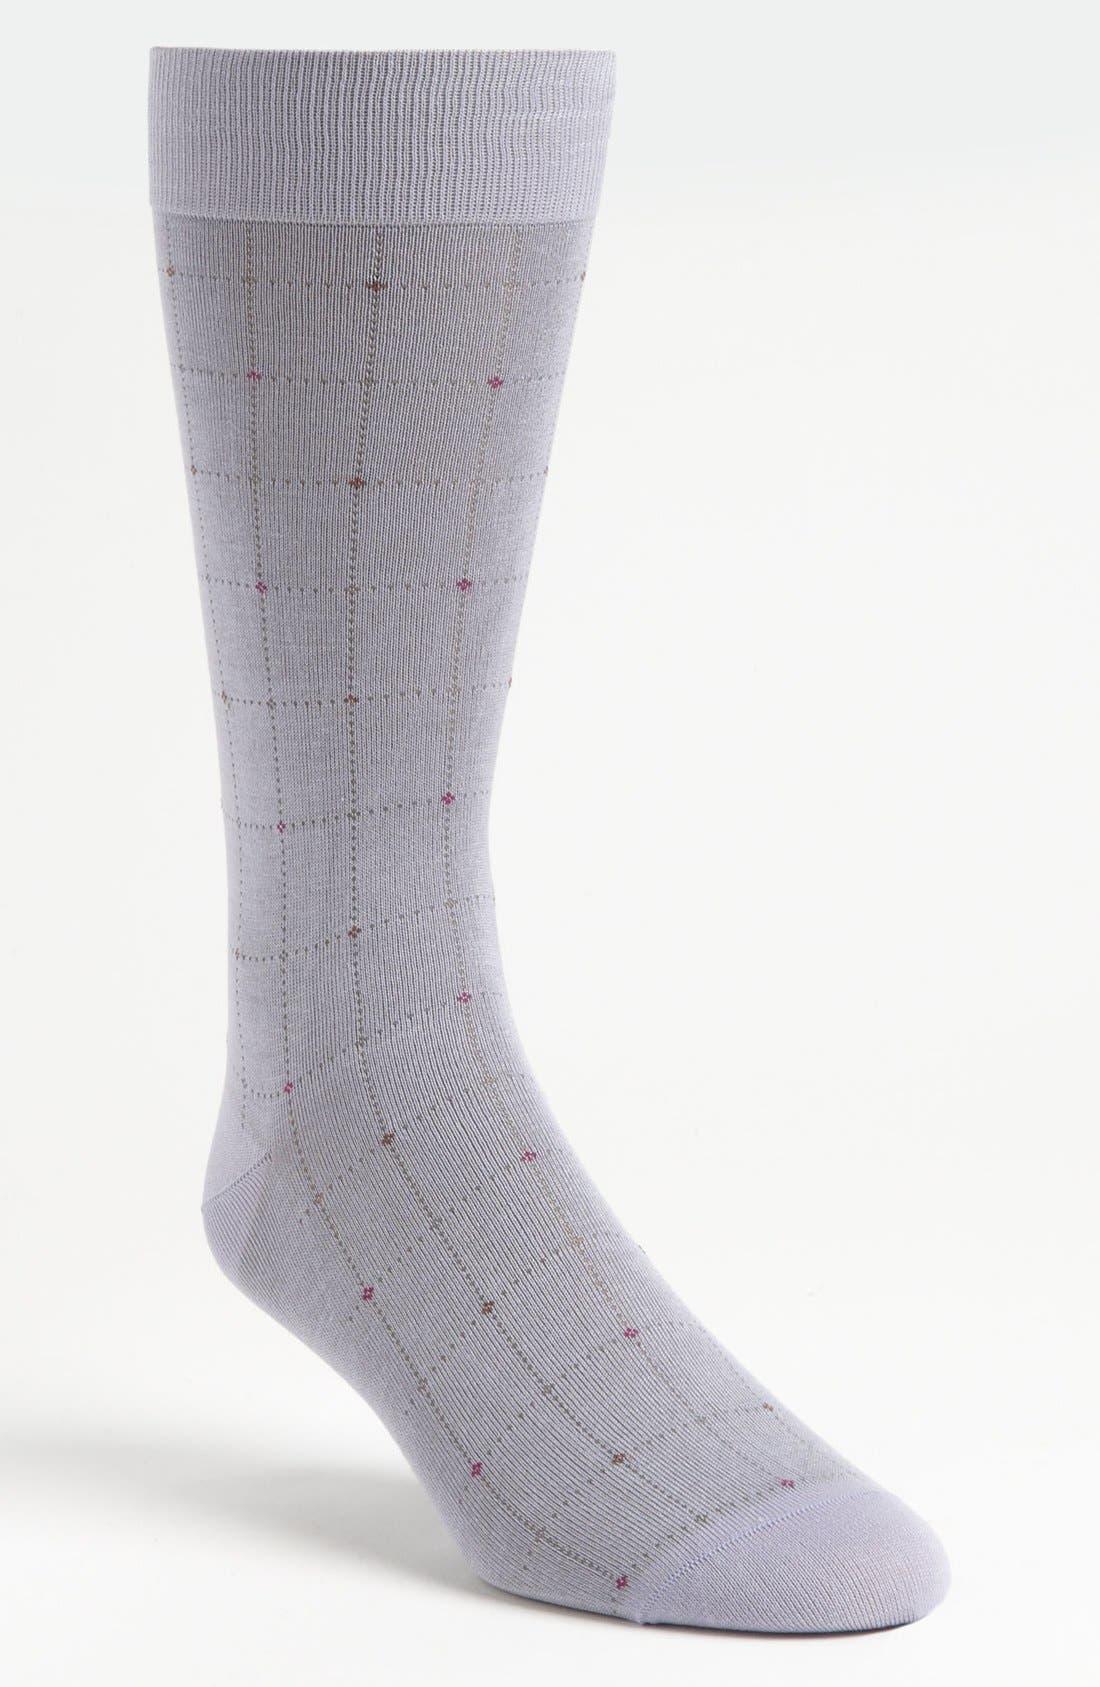 Alternate Image 1 Selected - Pantherella 'Pall Mall' Socks